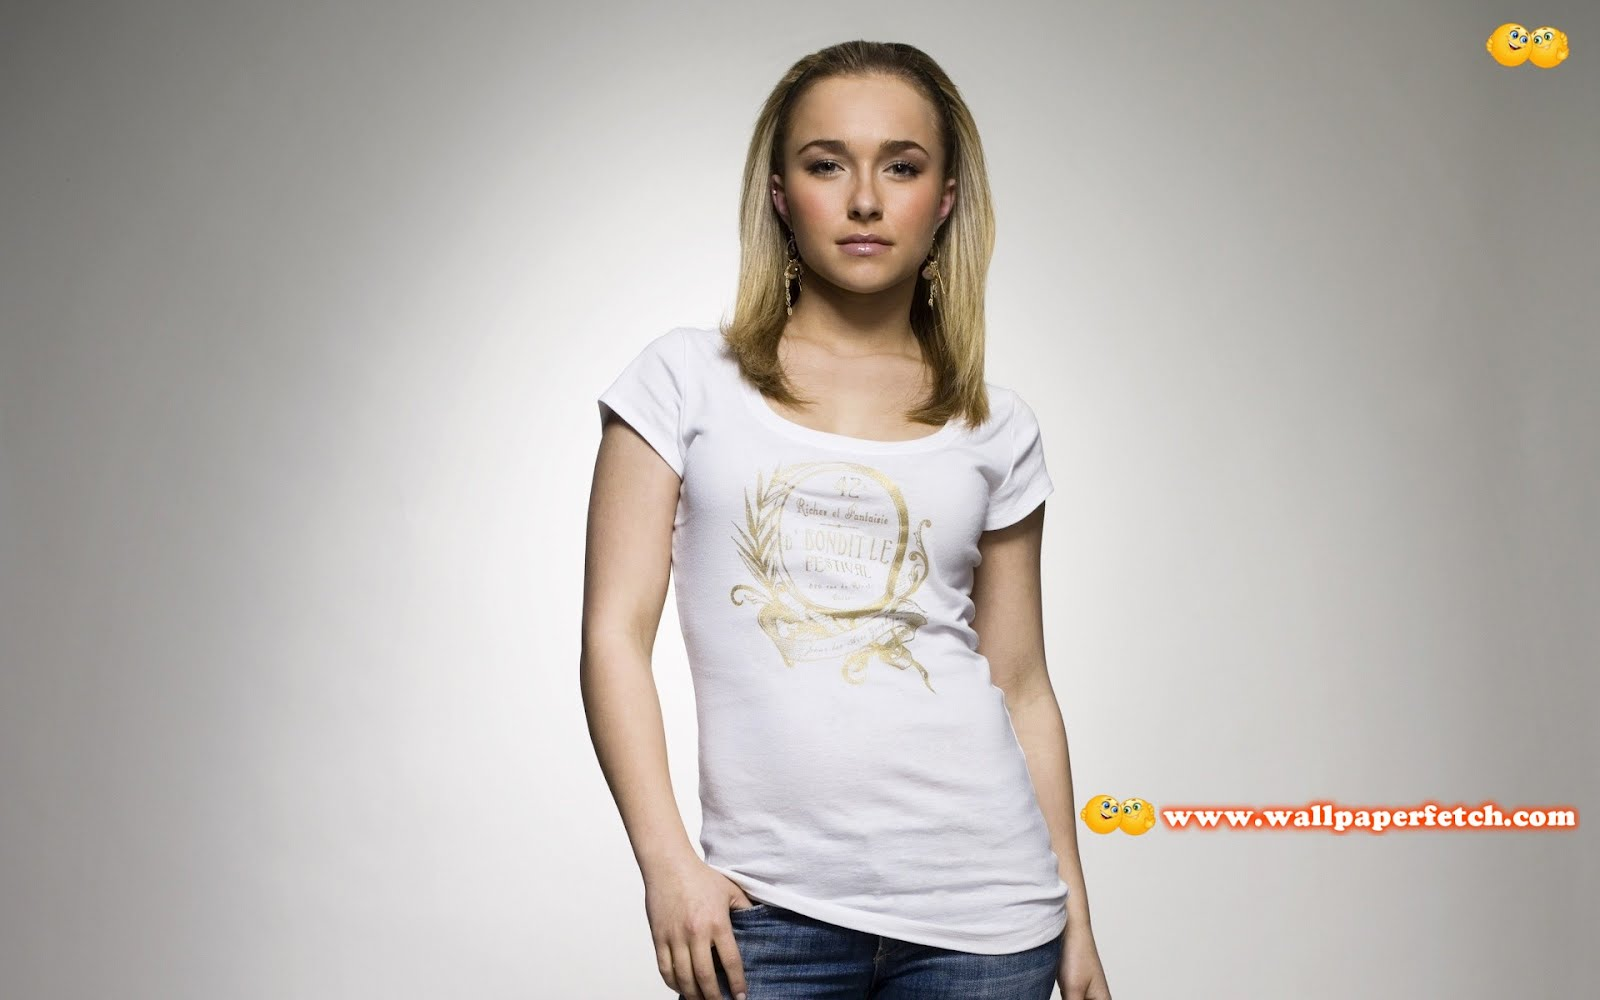 http://2.bp.blogspot.com/-MMKH9Ef9GSc/T1iah1p0pHI/AAAAAAAAAAc/29-R00O-yzA/s1600/hayden-panettiere-9358-1920x1200.jpg